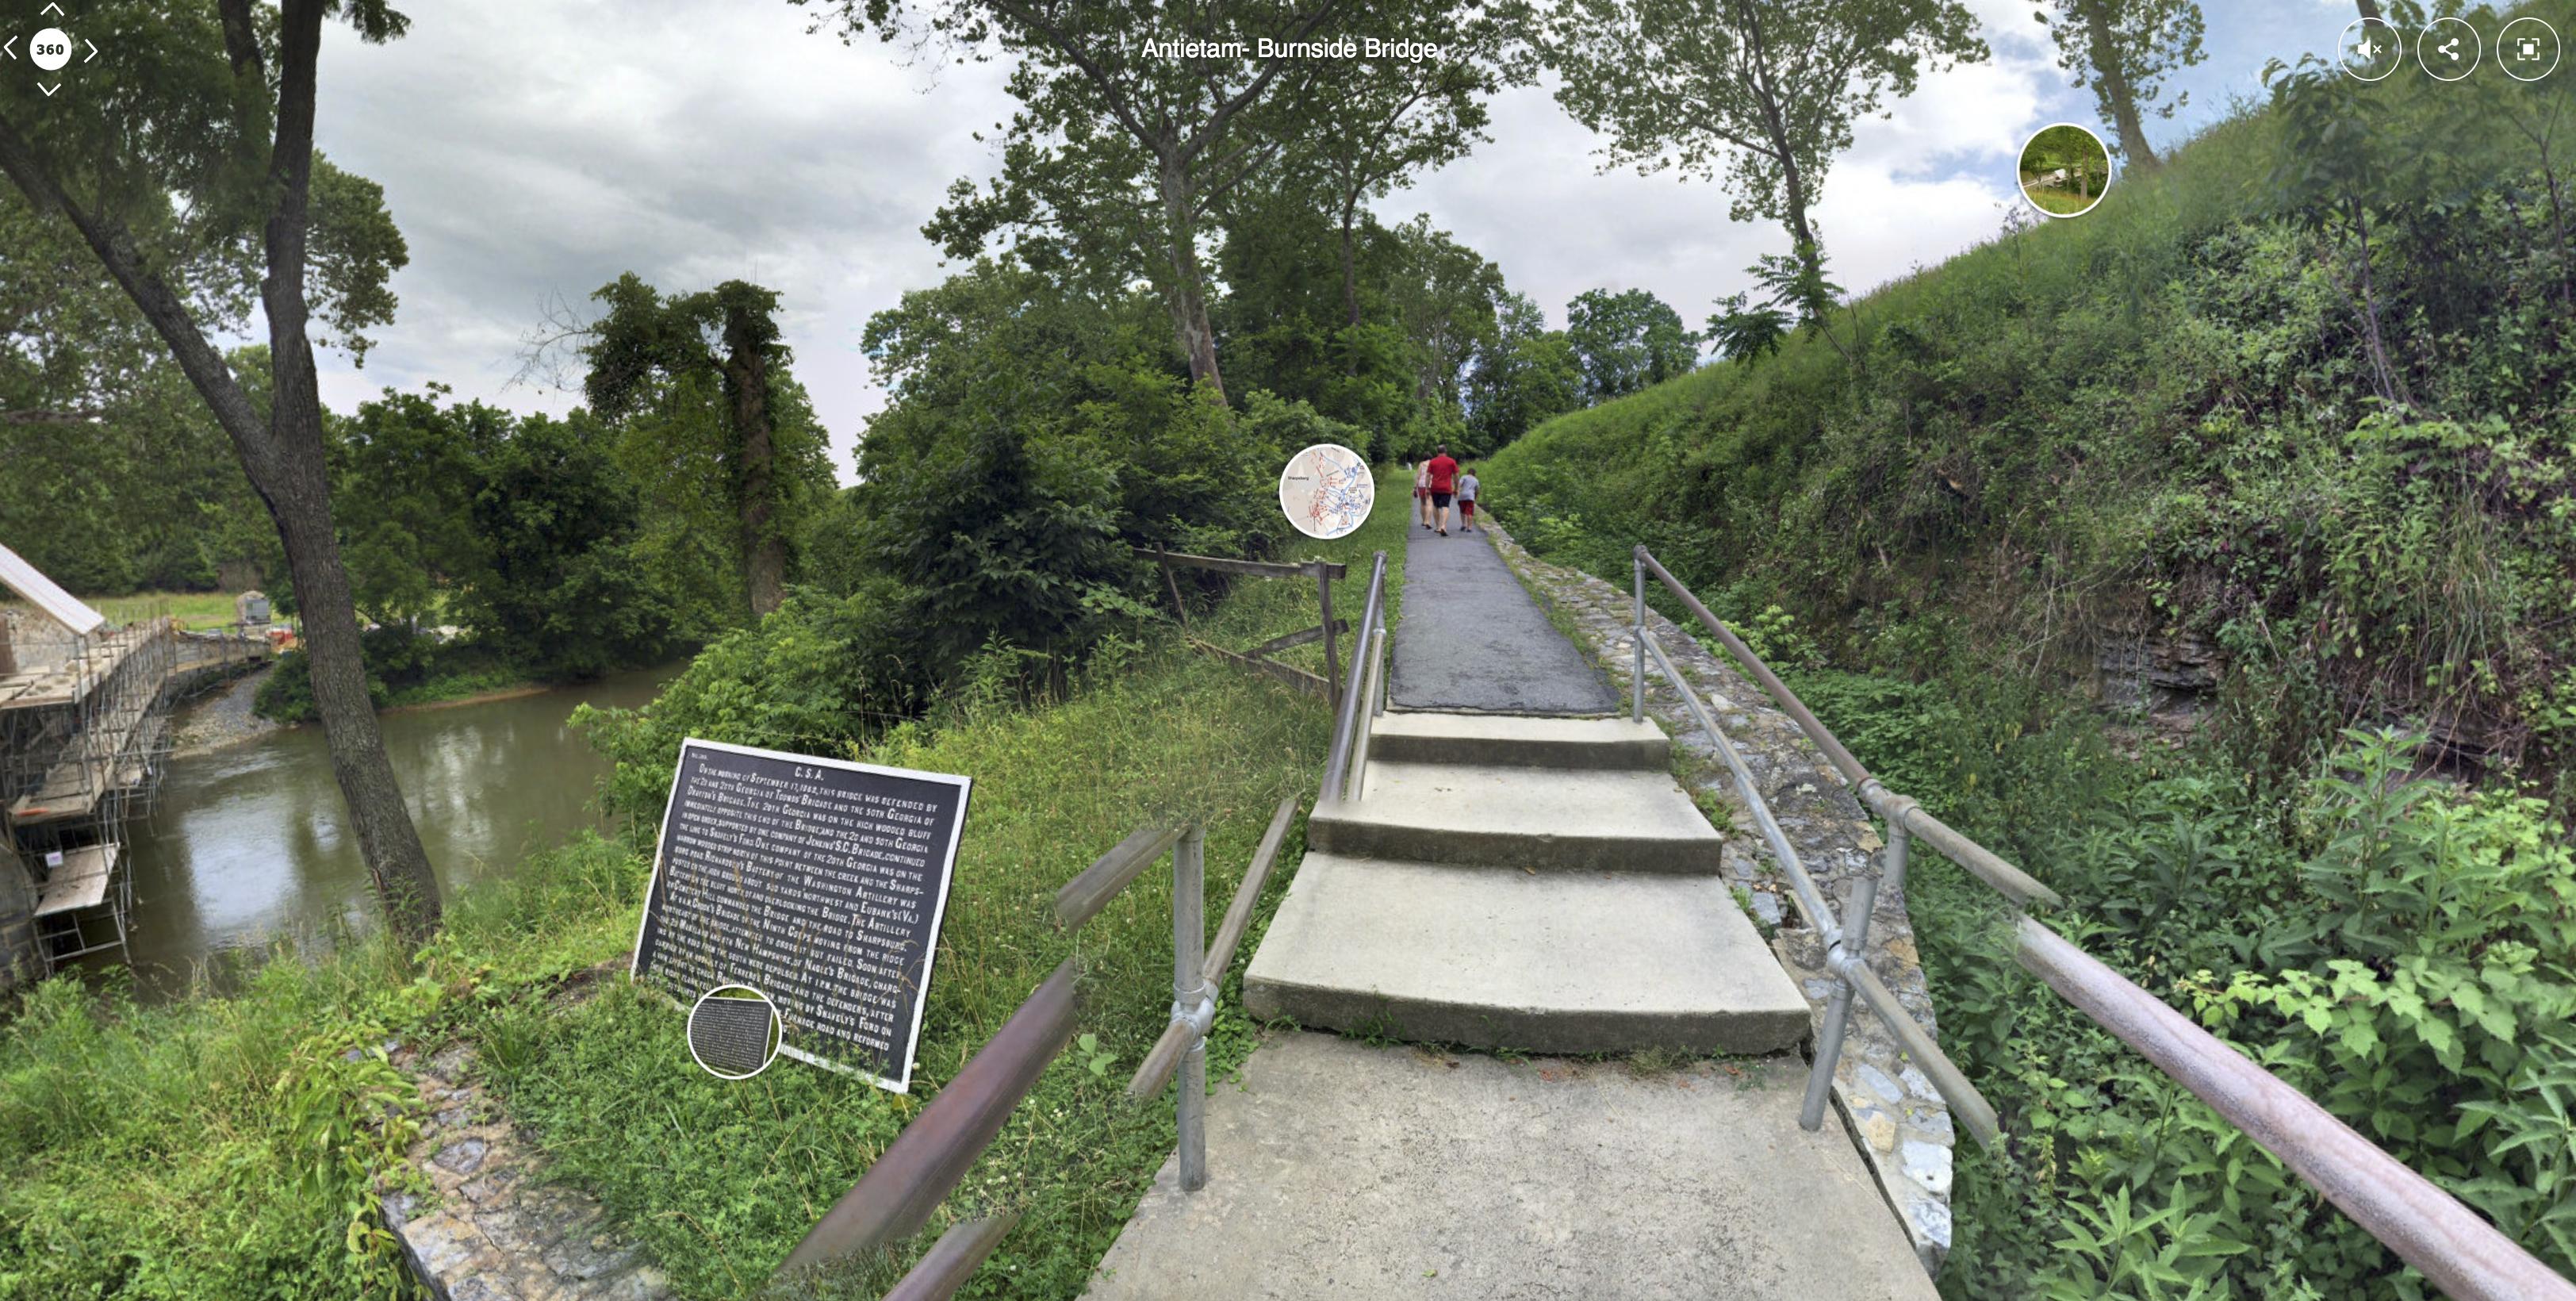 Antietam- Burnside Bridge by Andy Fehnel